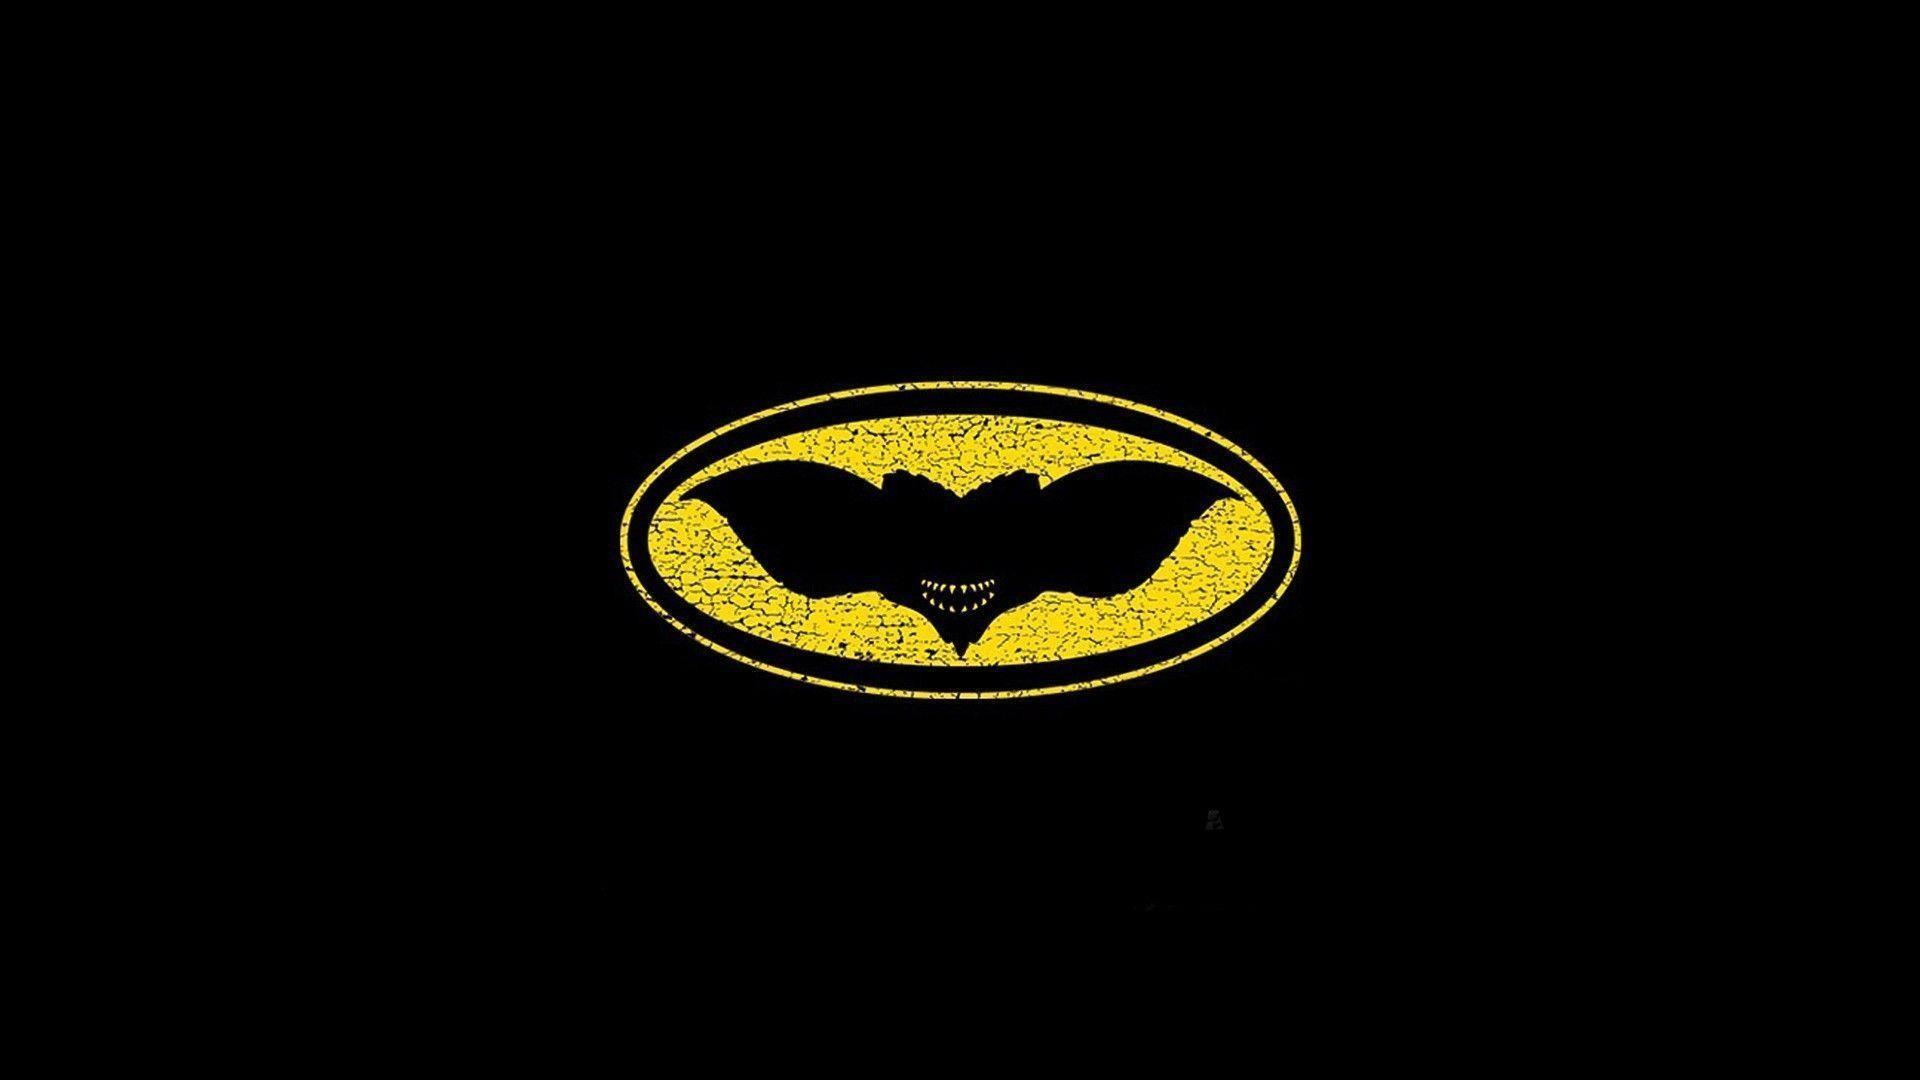 Res: 1920x1080, Batman movie Gremlins logos hd wallpaper background Â« Logo wallpapers